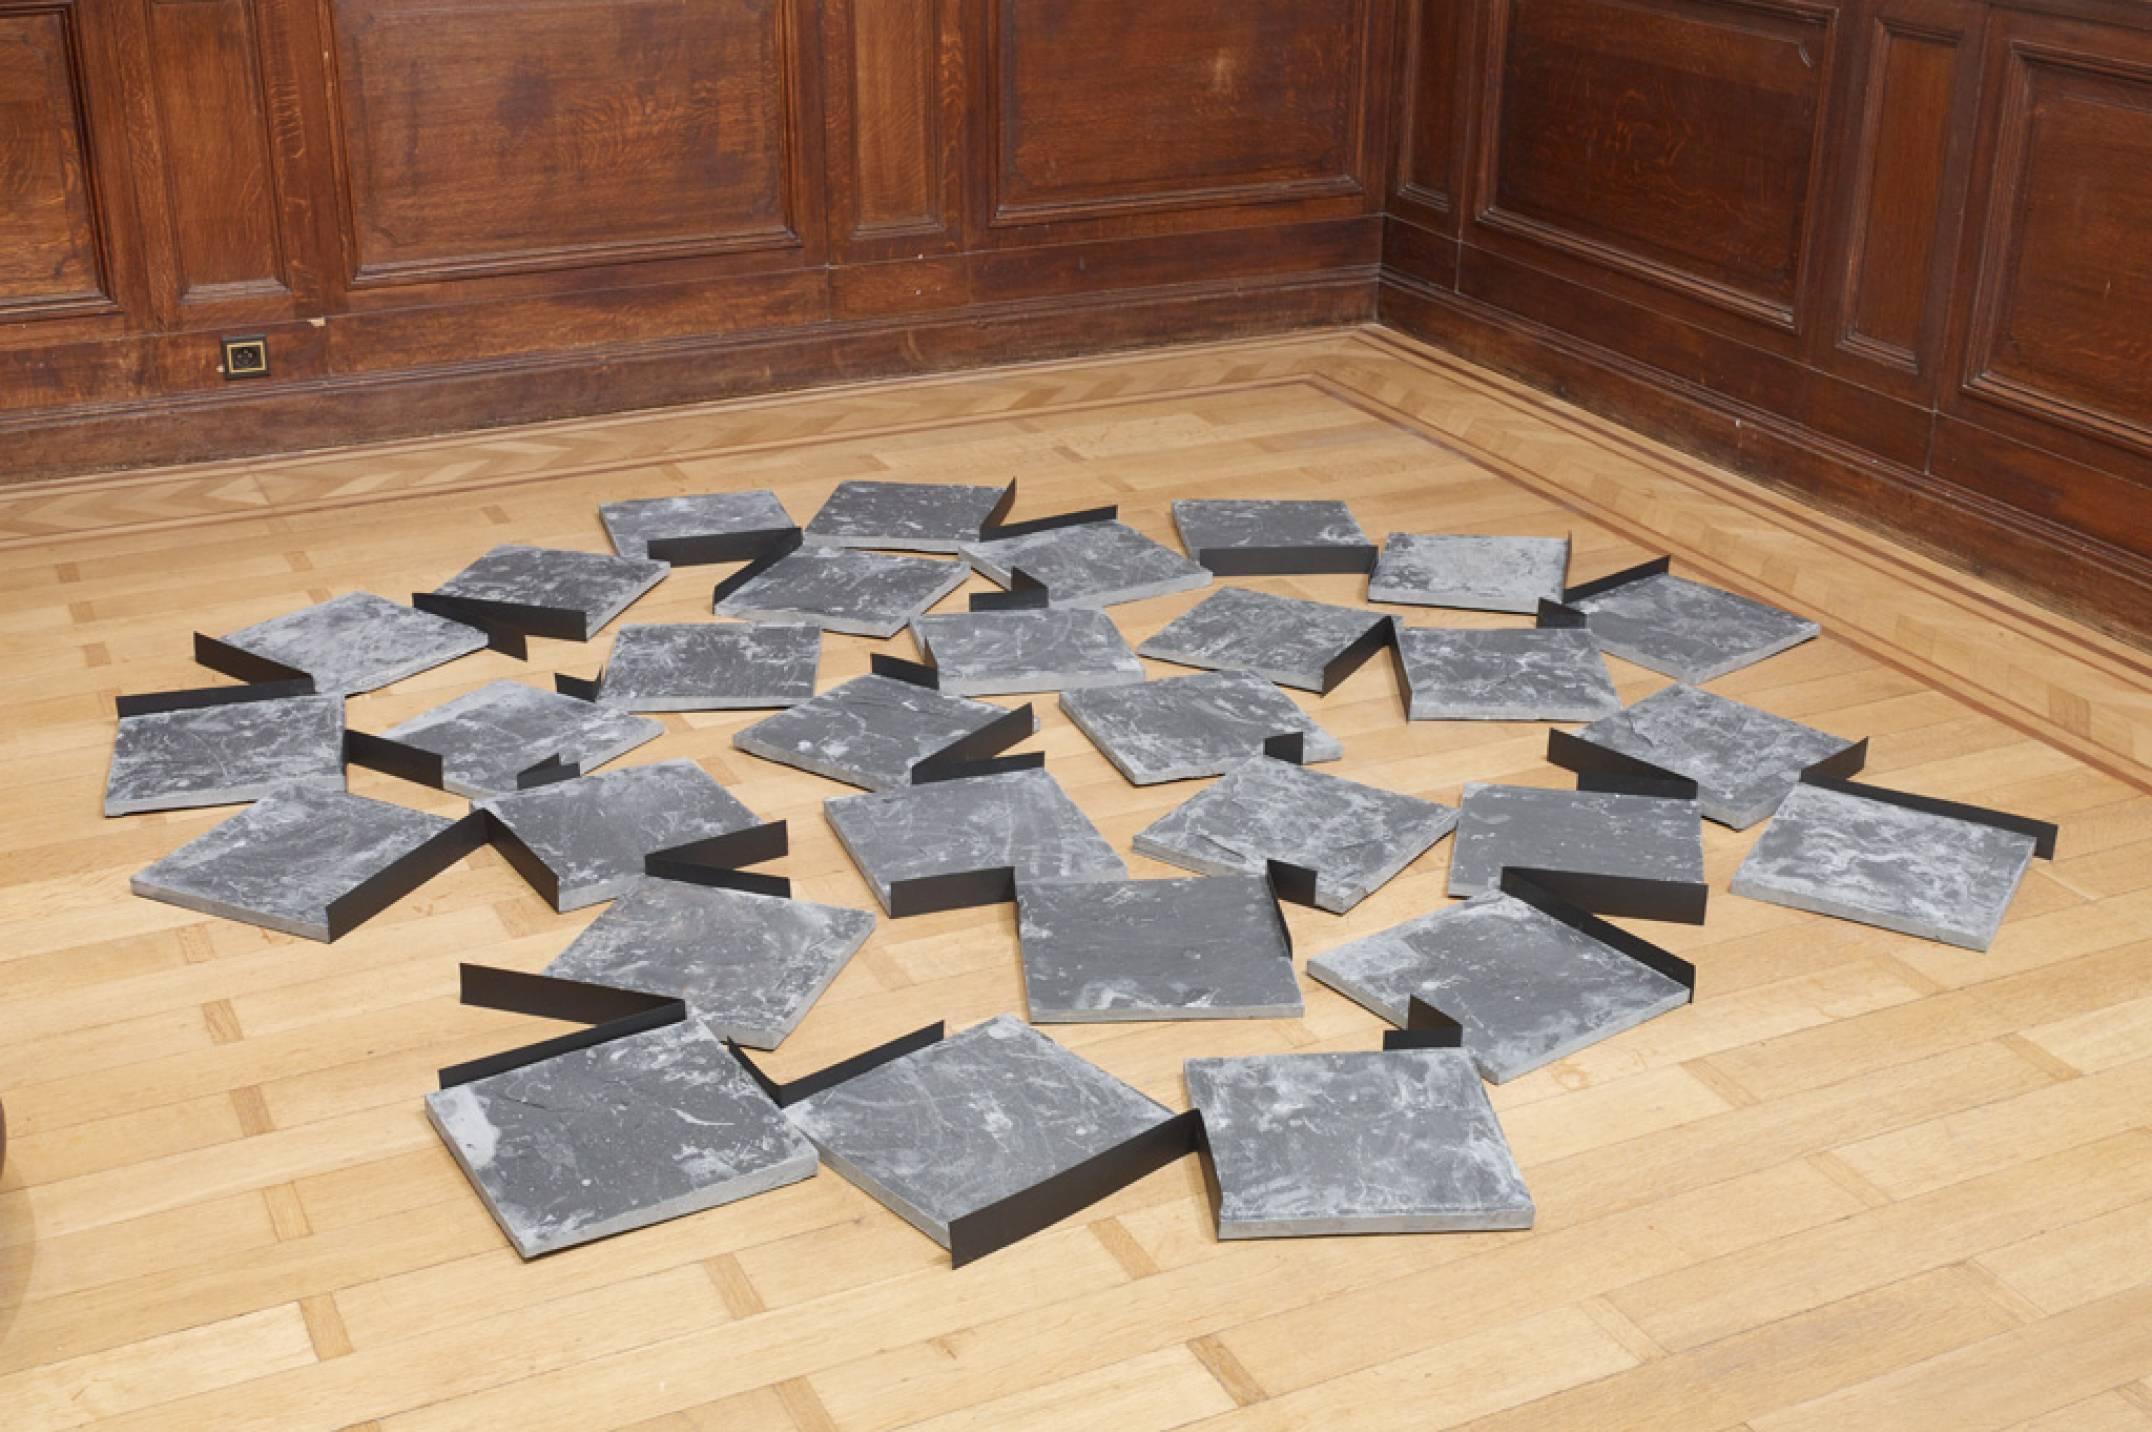 Kishio Suga,<em>Placement of Stone Entities</em>, 1982/2017, stone, paper, variable dimensions - Mendes Wood DM